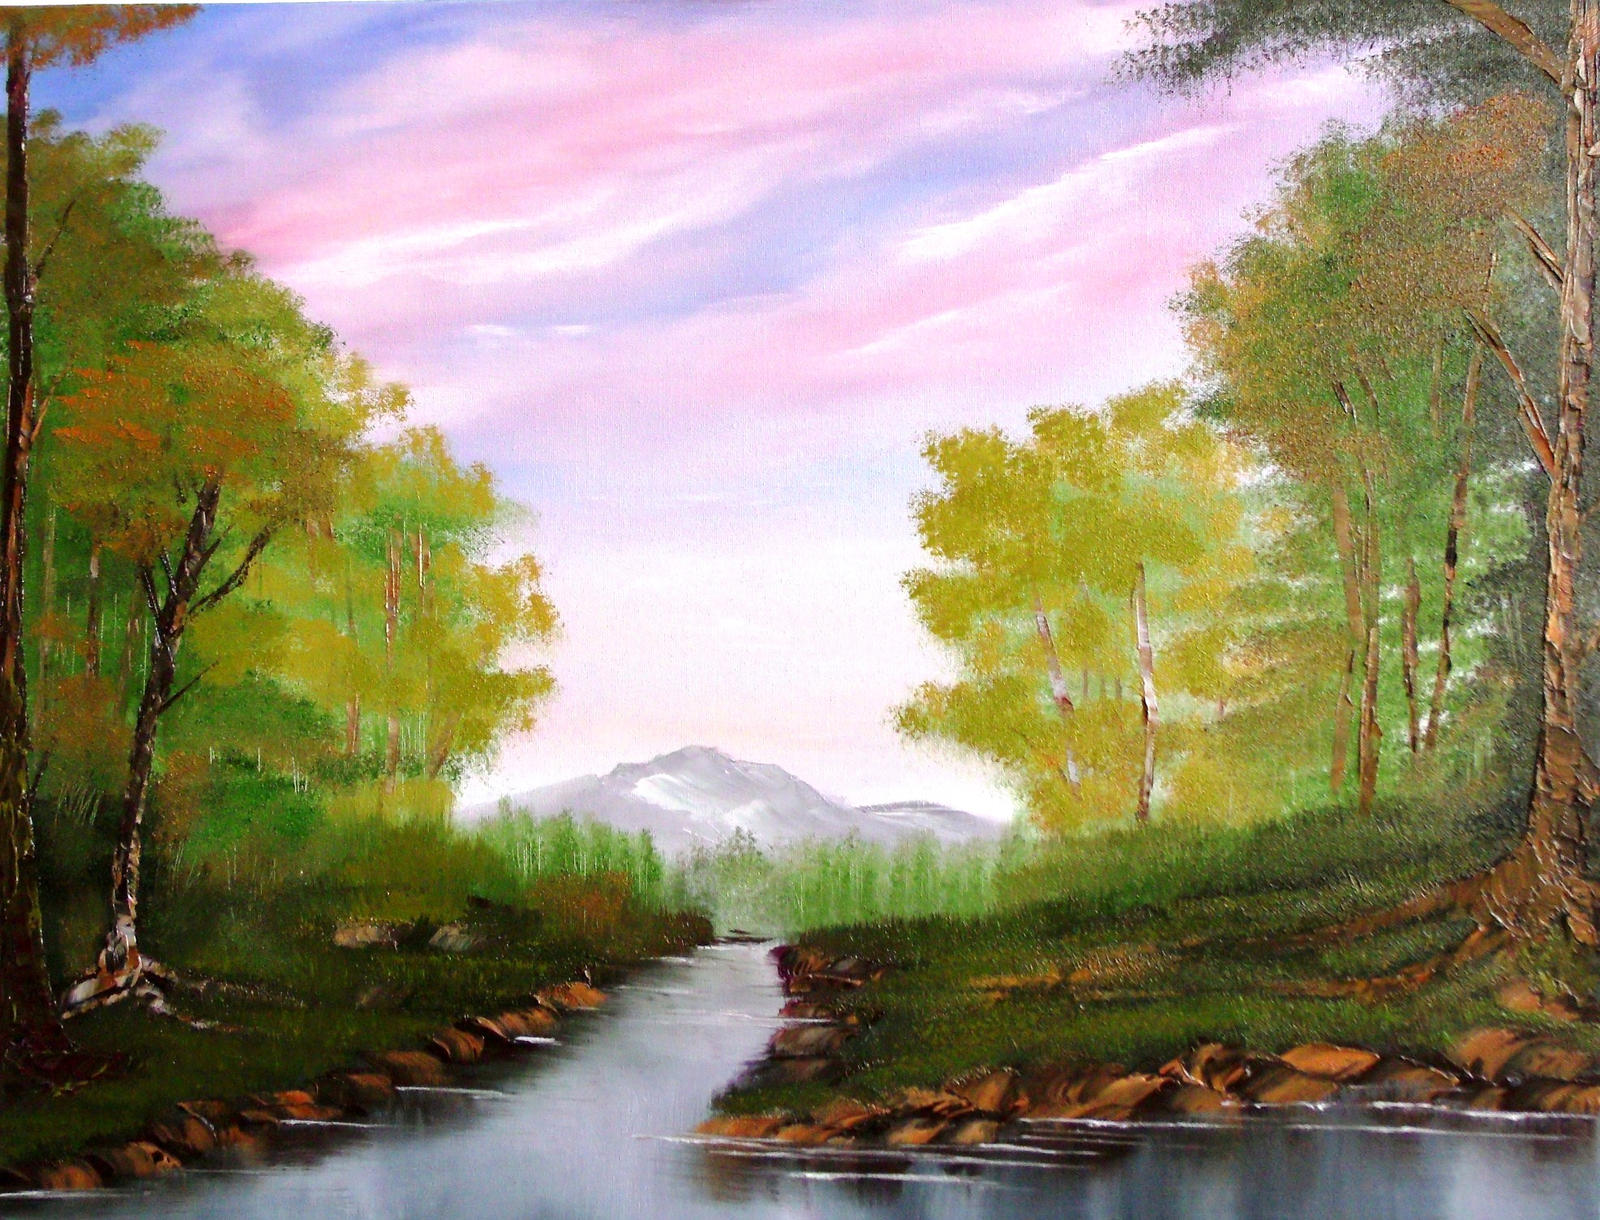 Nature Art Painting Easy | www.imgkid.com - The Image Kid ...